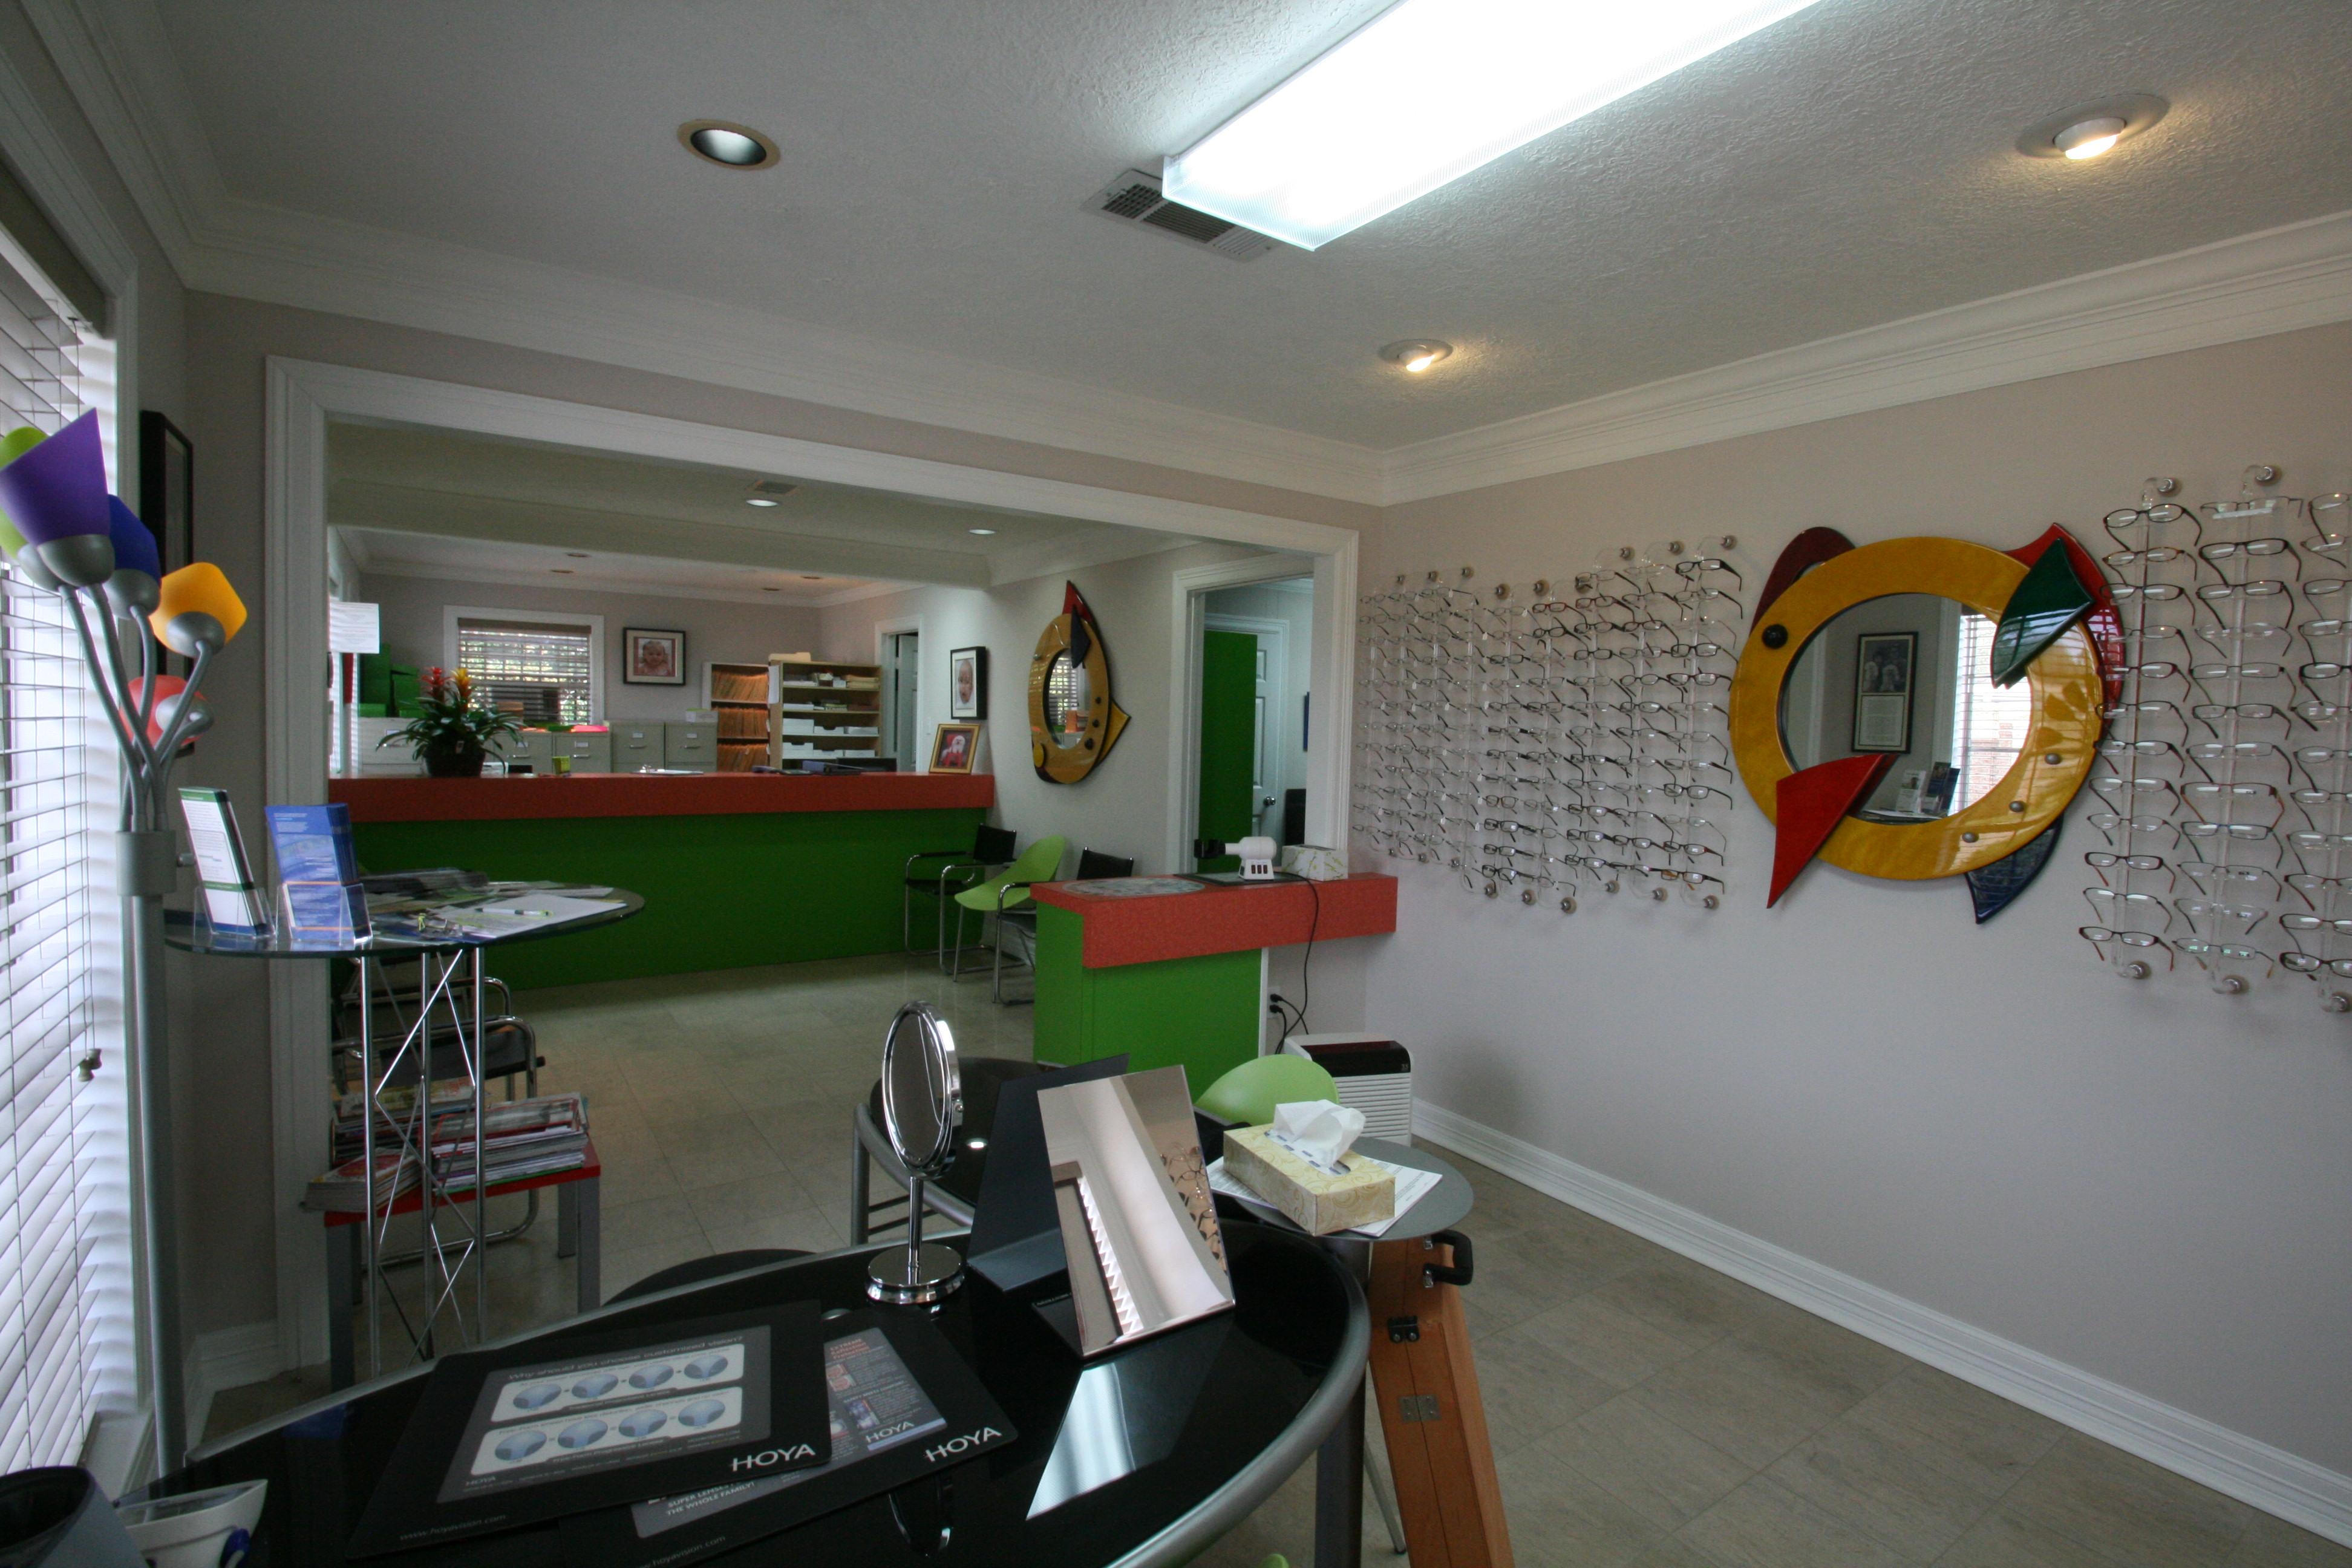 Beaumont interior img 0874